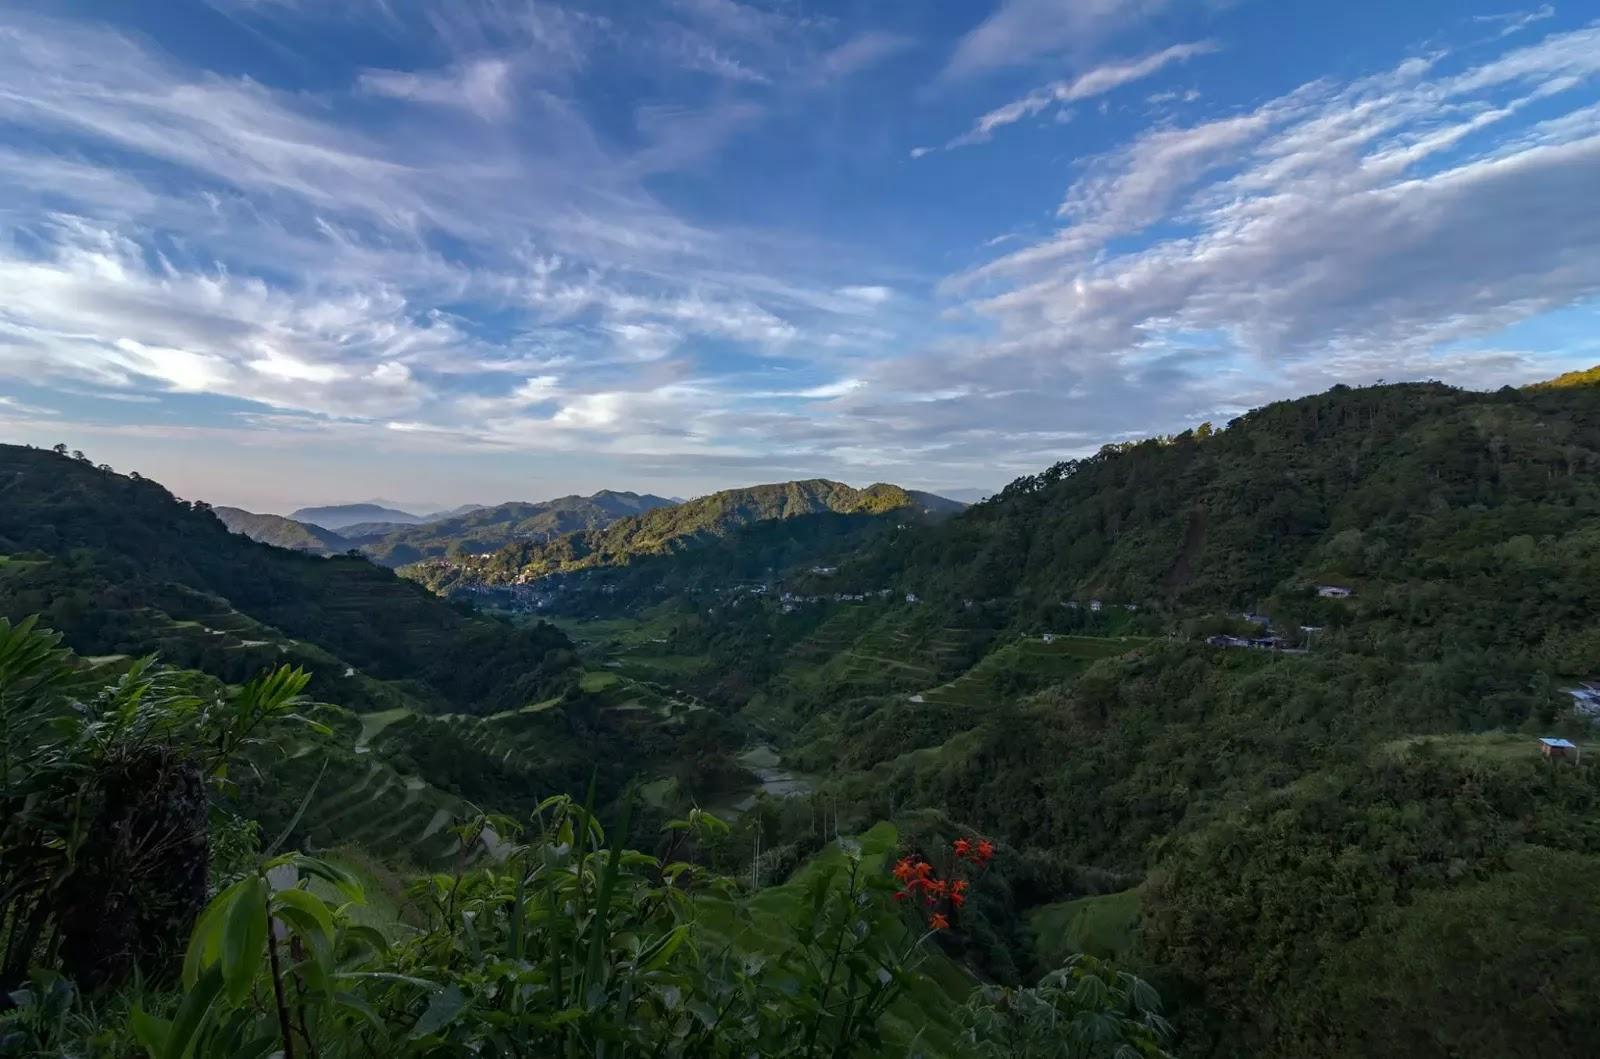 One Fine Morning Banaue Rice Terraces Ifugao Cordillera Administrative Region Philippines